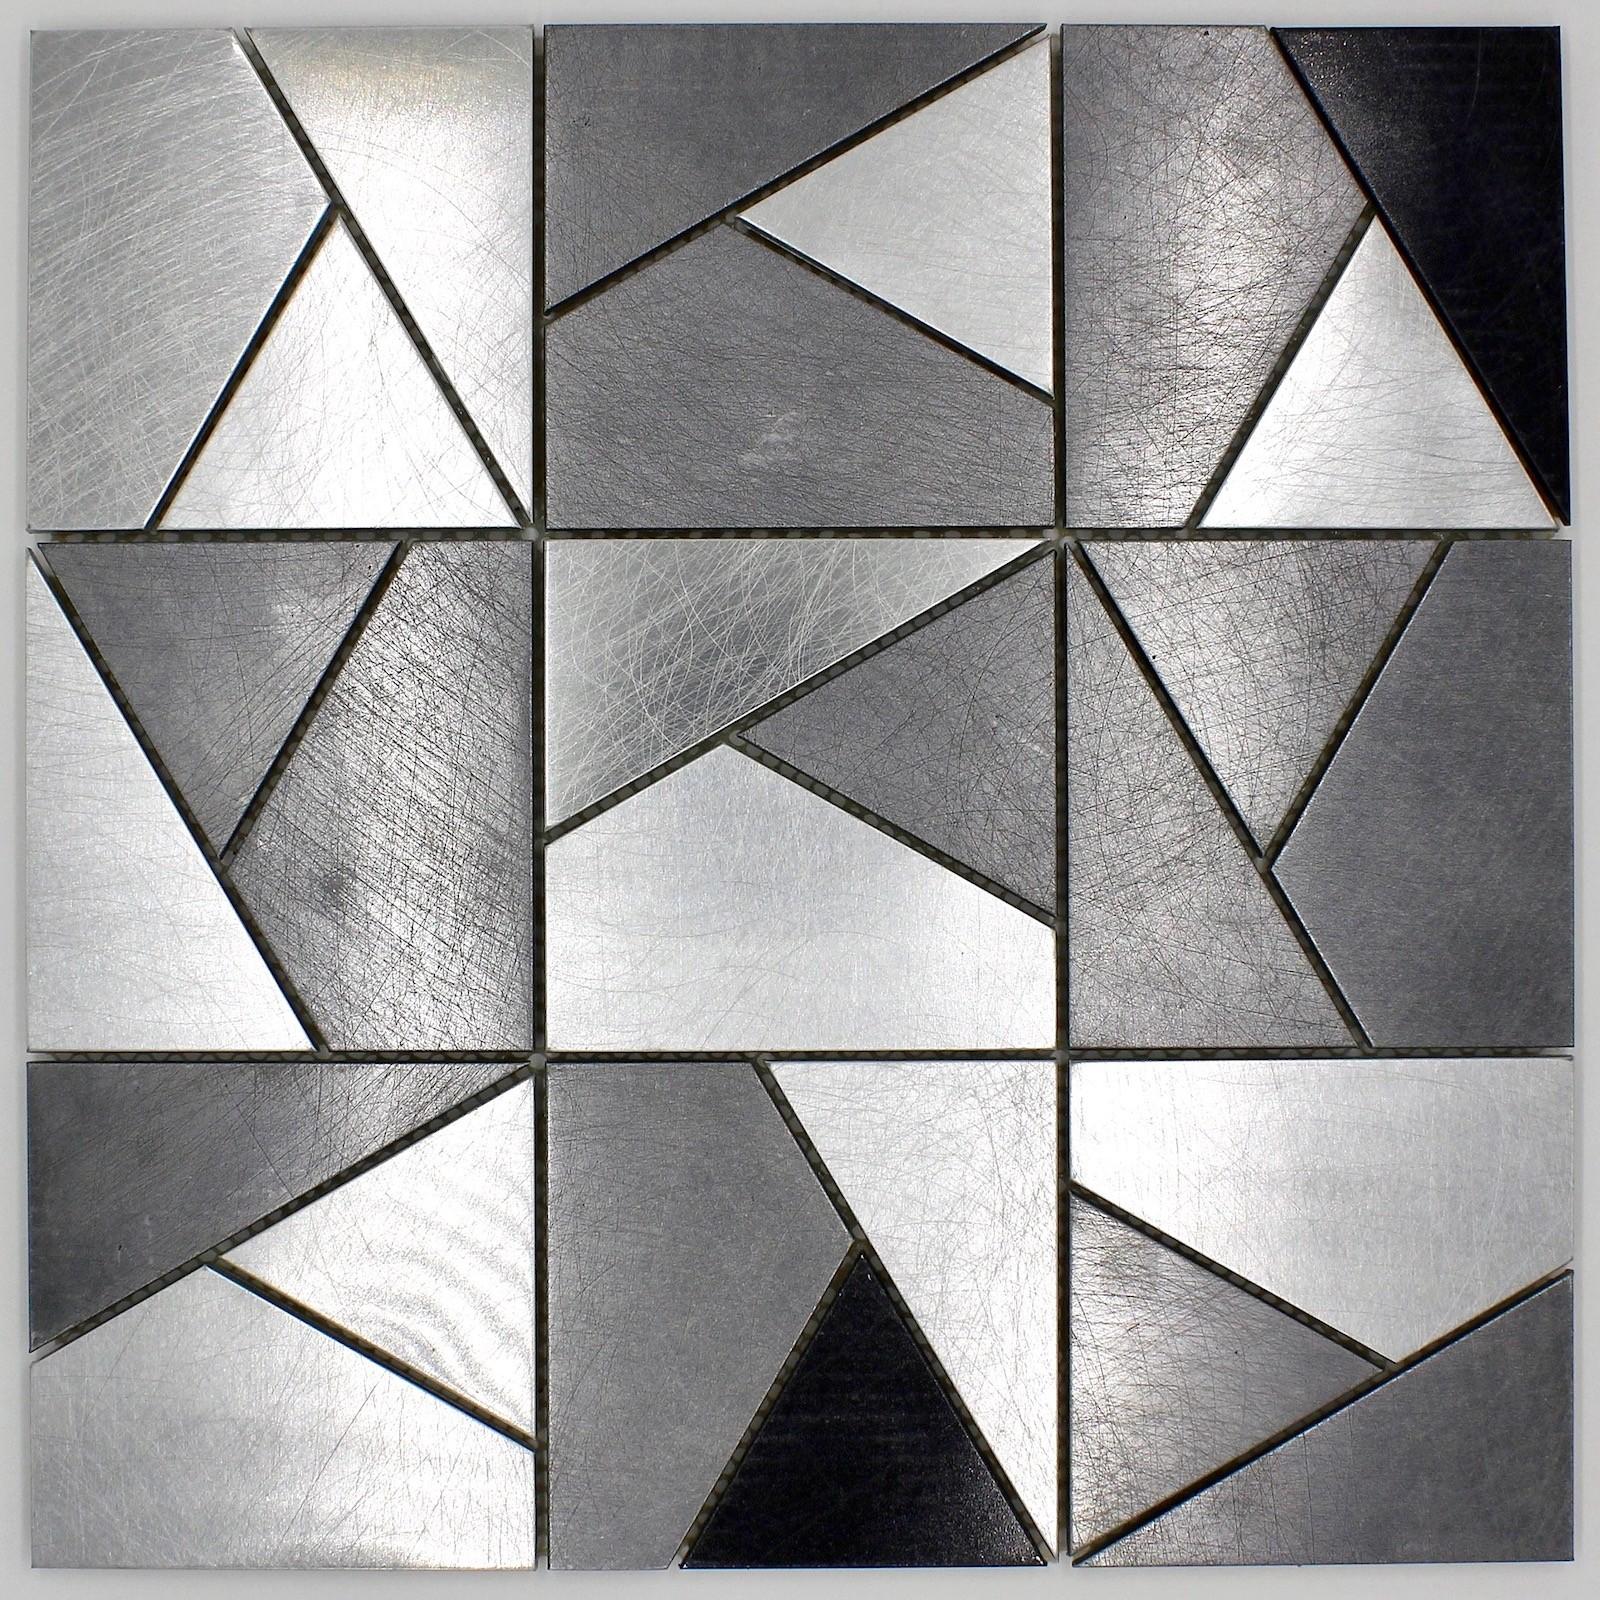 Credence En Gres Cerame carreaux mosaique metal mur credence cuisine sierra